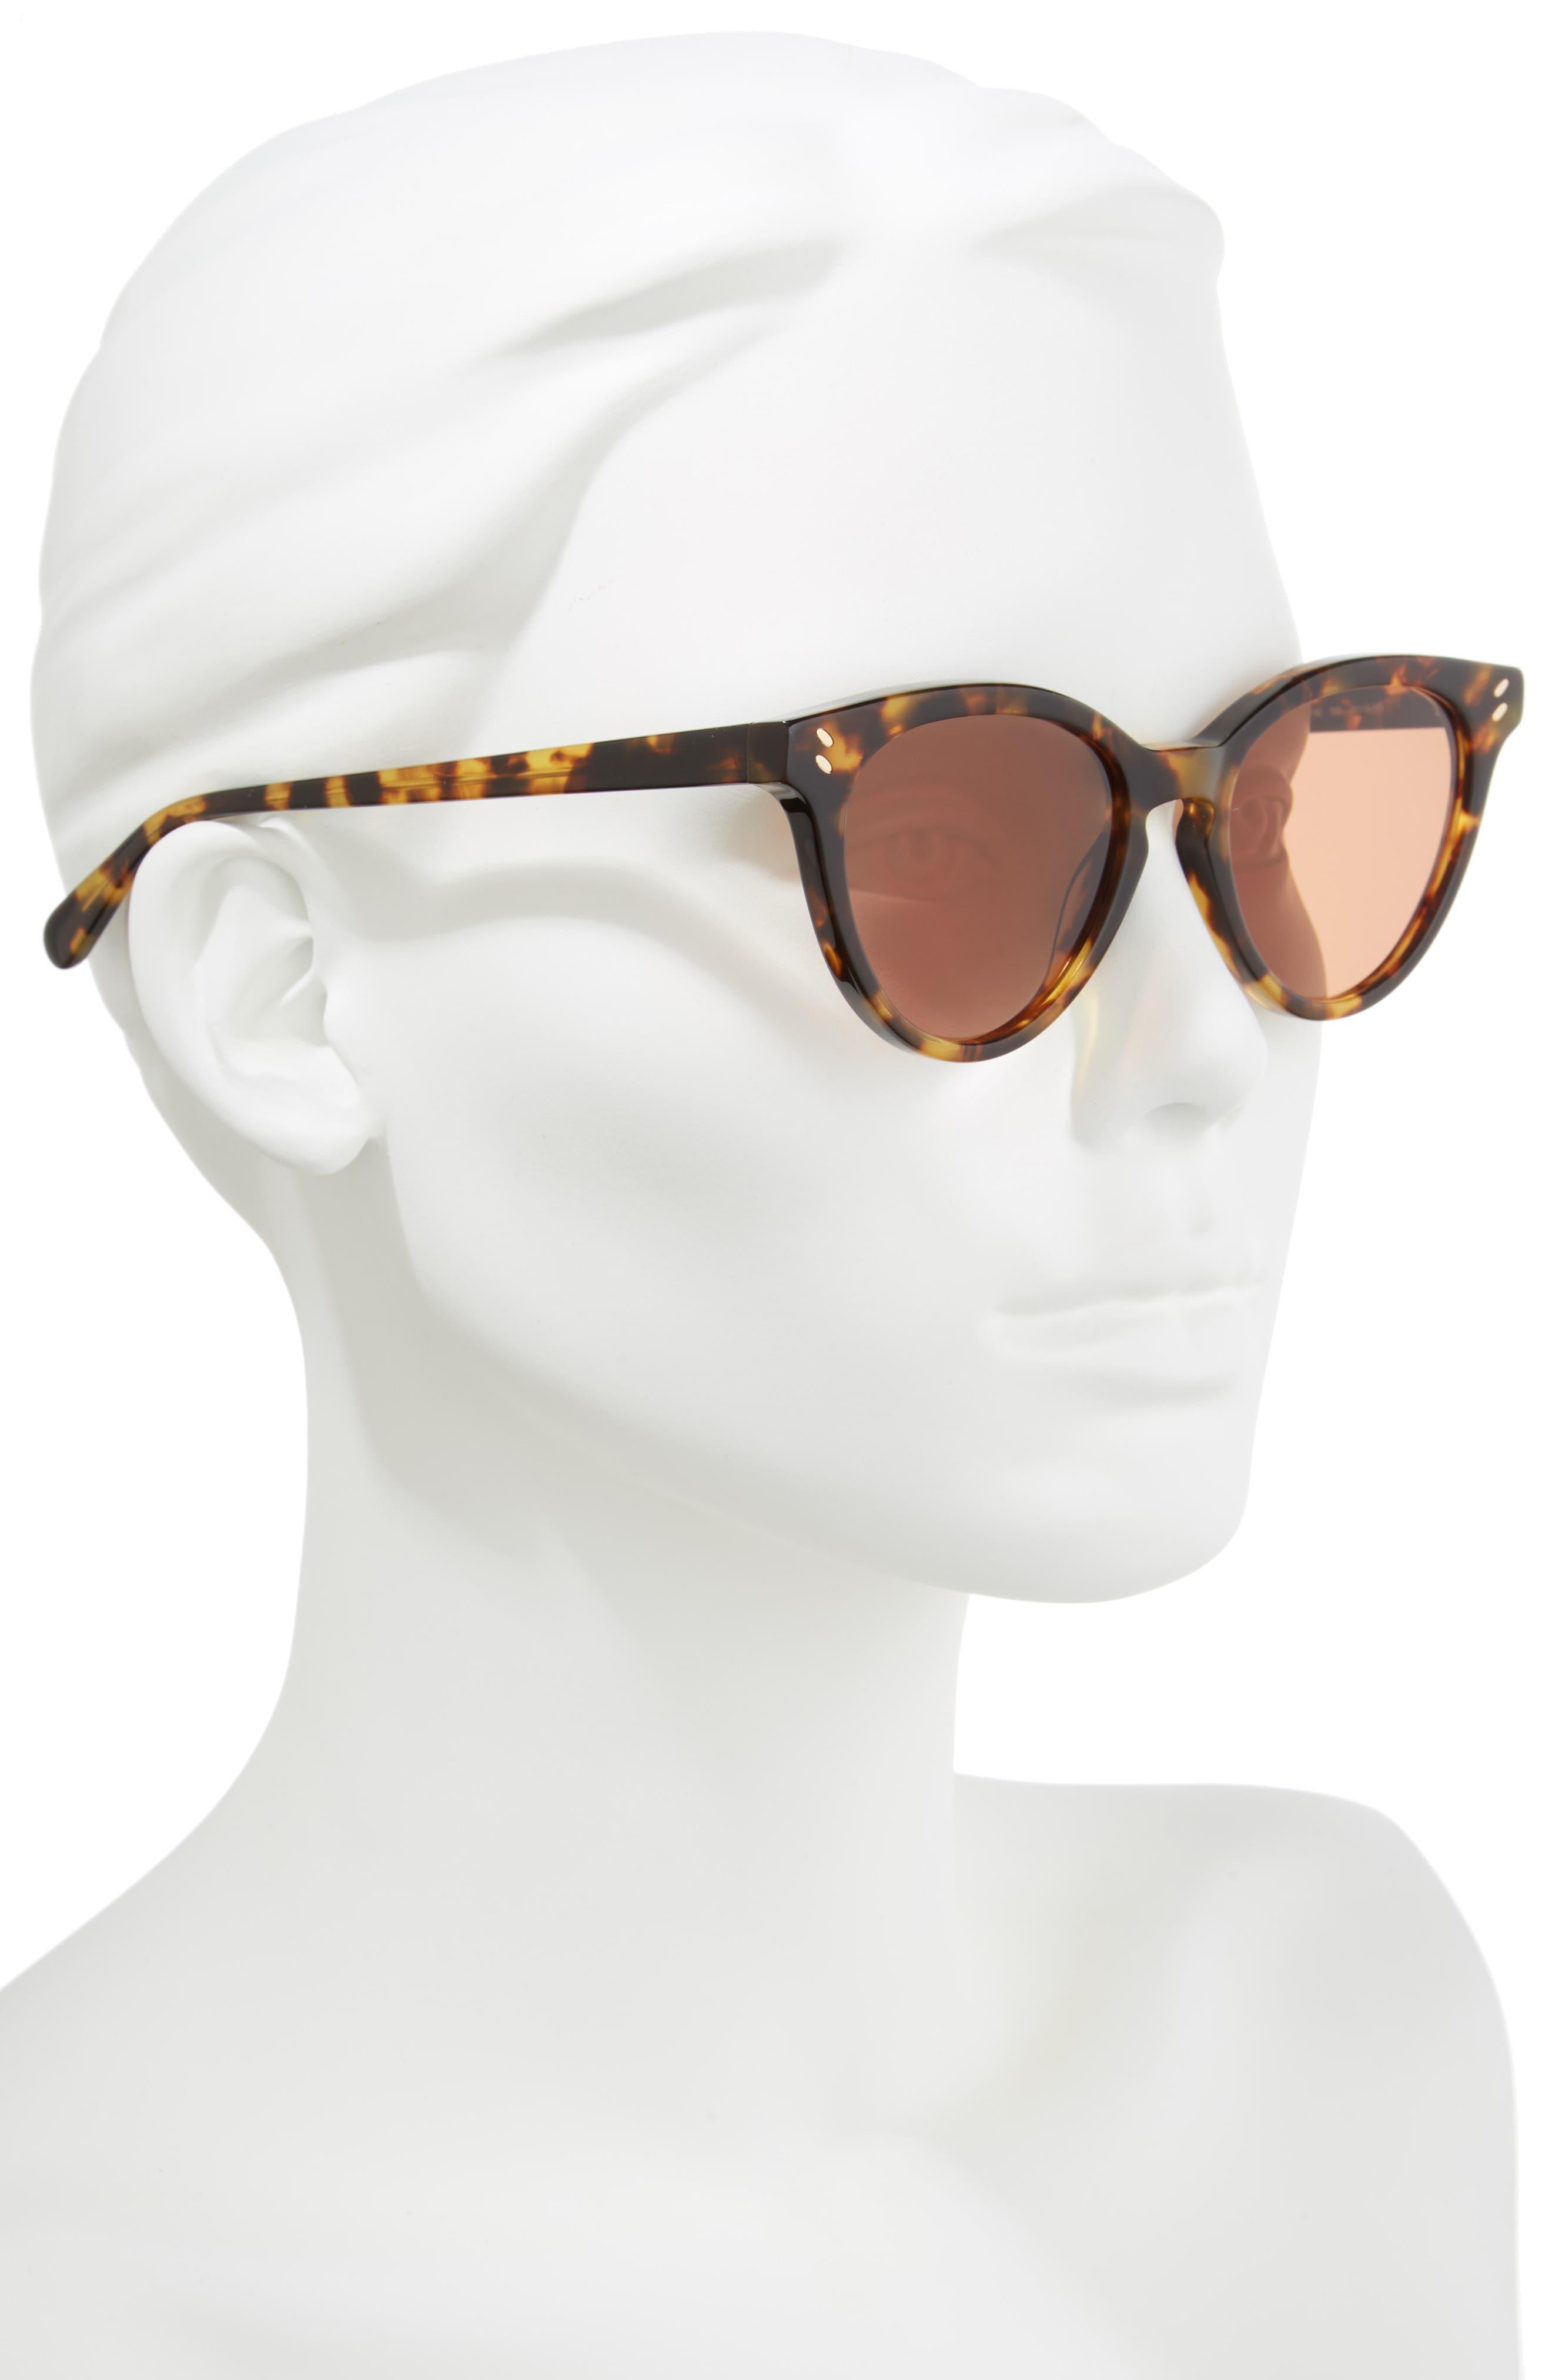 50mm Round Sunglasses,                             Alternate thumbnail 2, color,                             Medium Havana